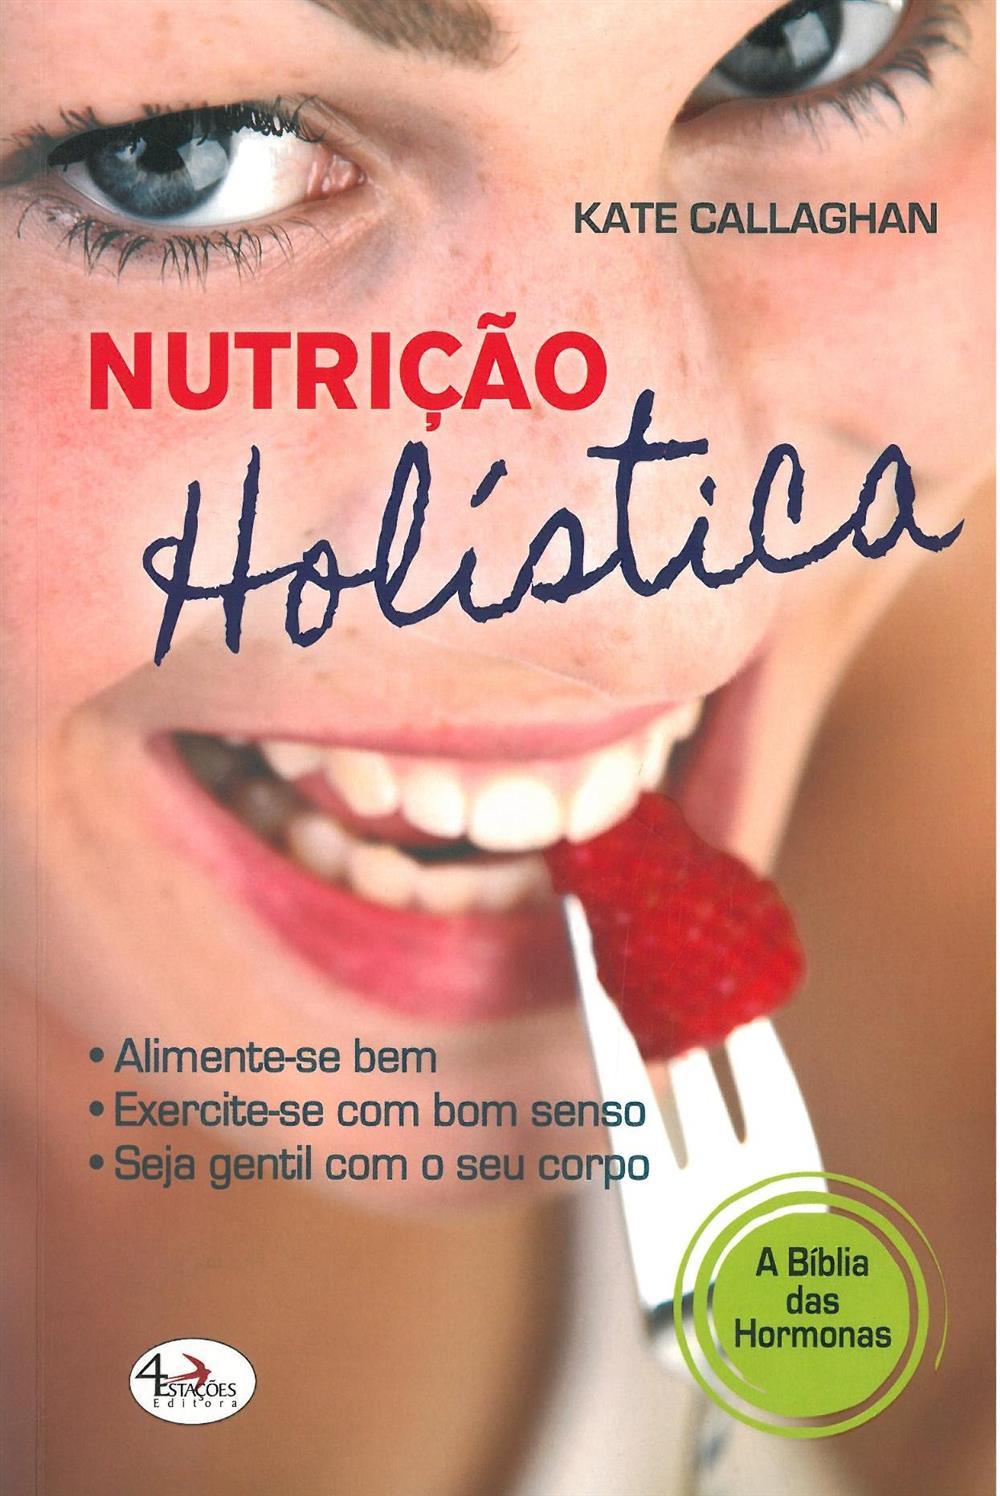 Nutrição holística_.jpg